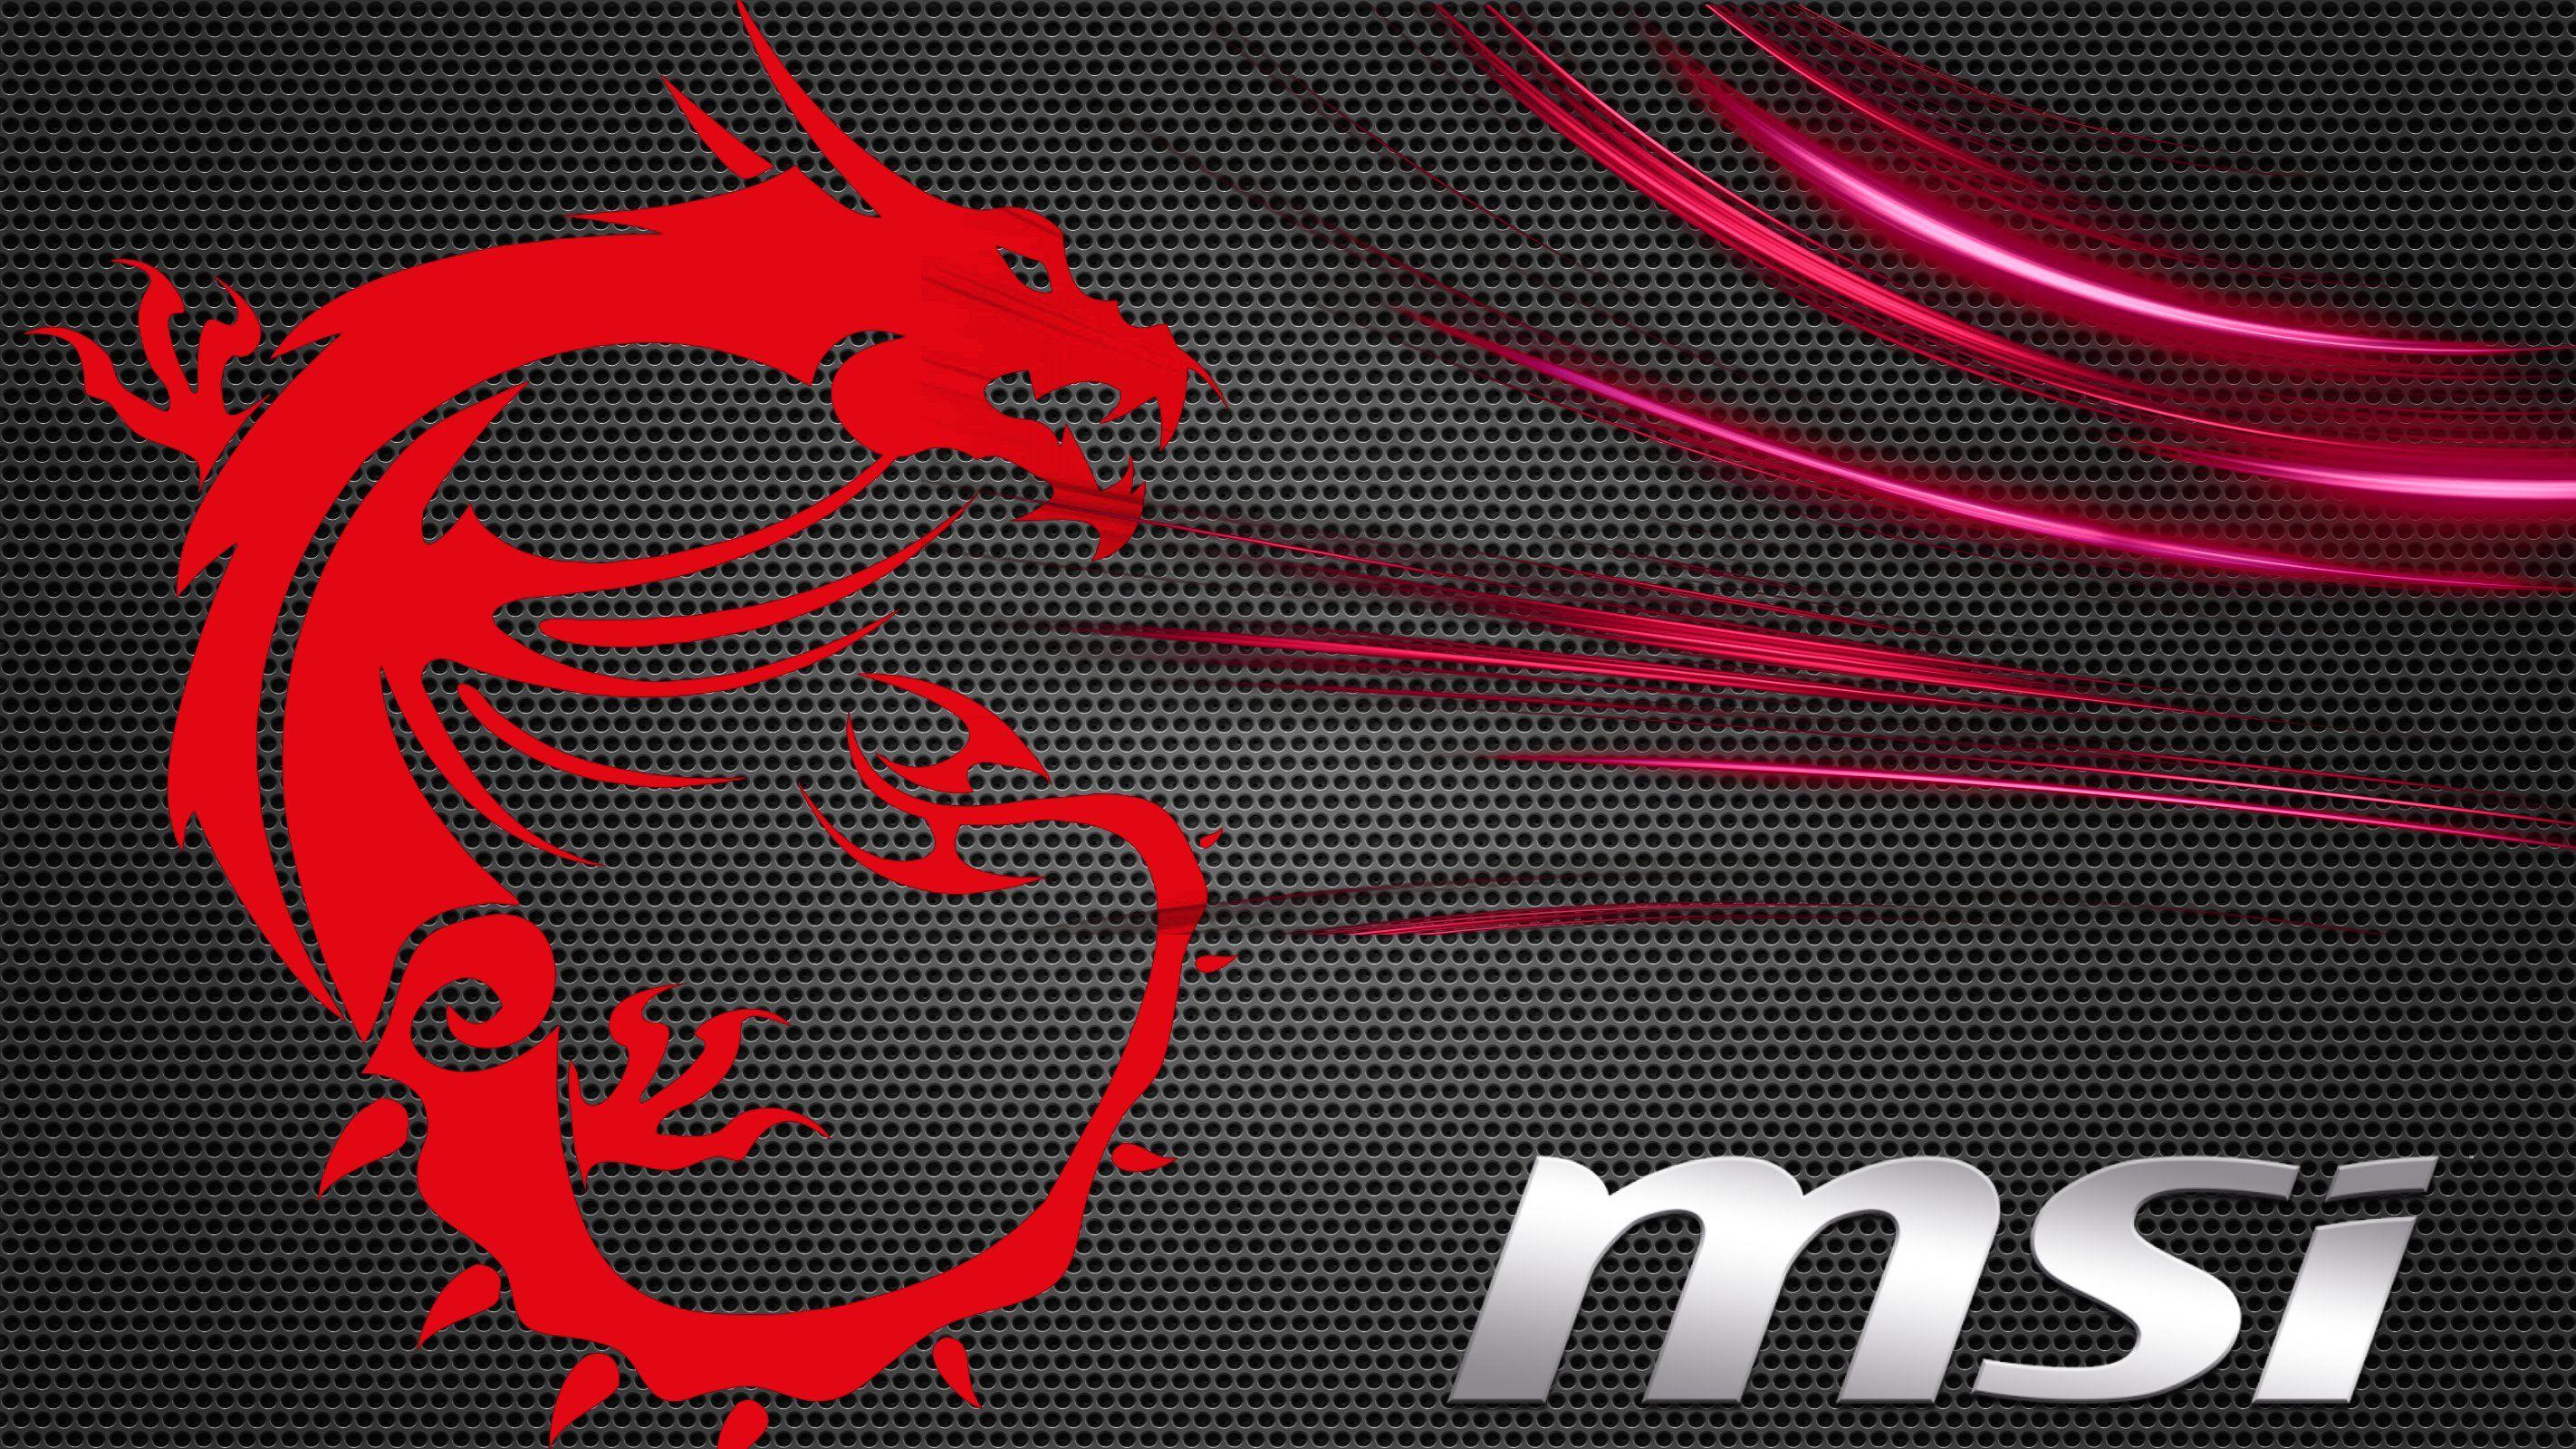 Msi g series wallpaper notebookreview -  Gateway Wallpaper Notebookreview Download Wallpaper Msi